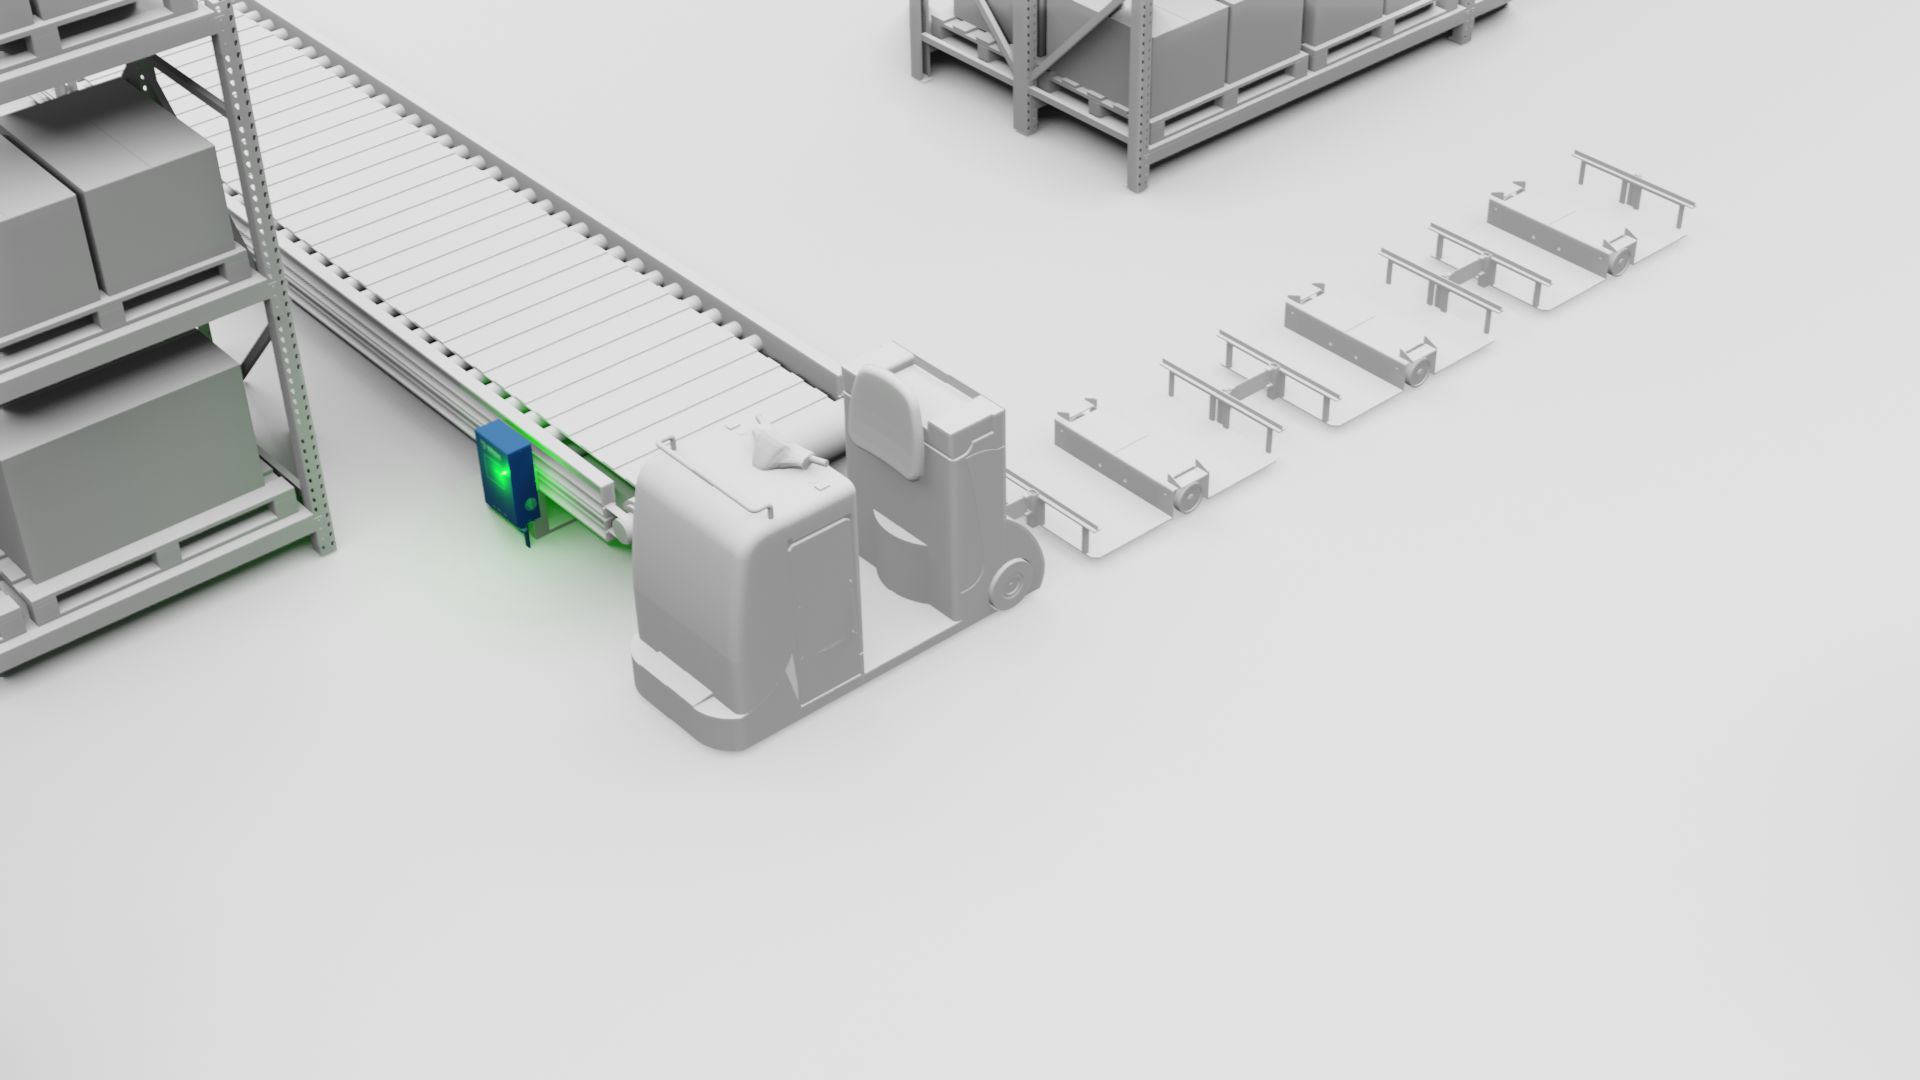 automatisierte routenzüge - automated tugger trains - industrial trucks